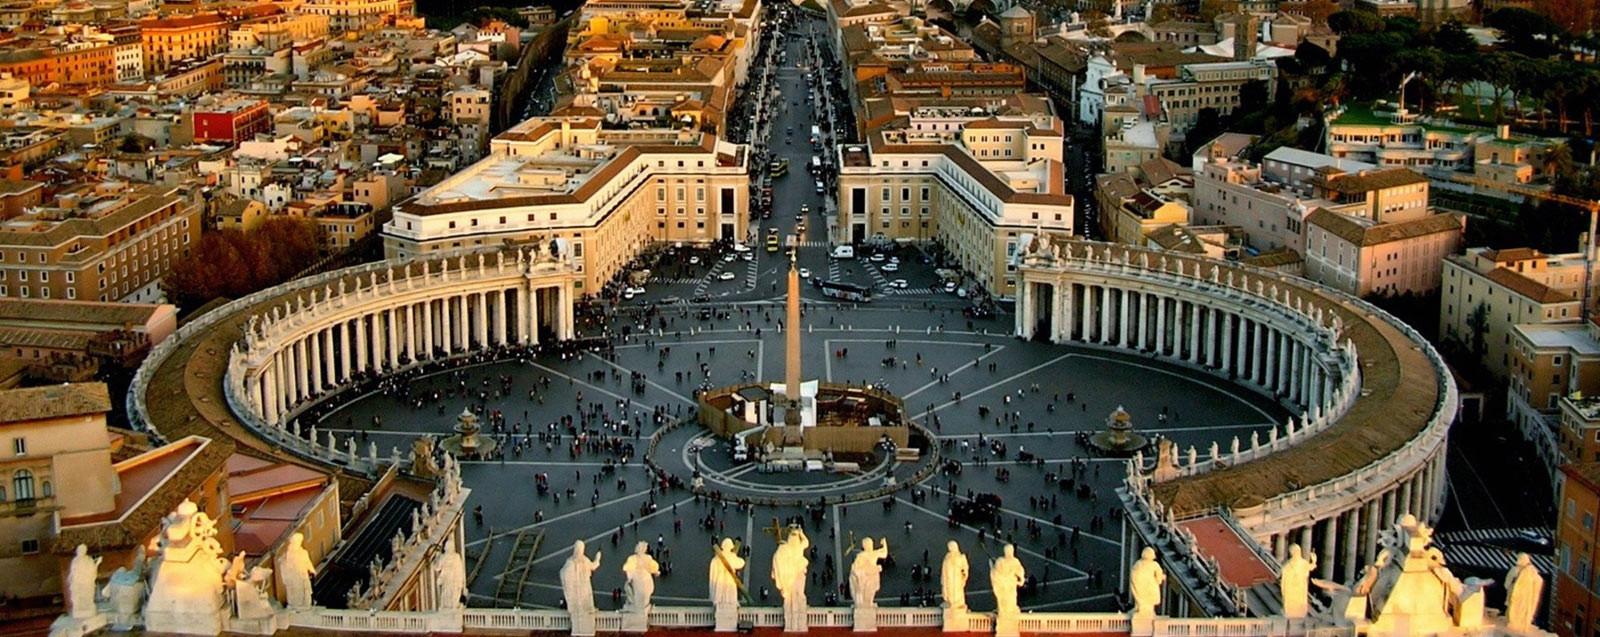 Vascular Surgery 2019 - Rome ,Italy